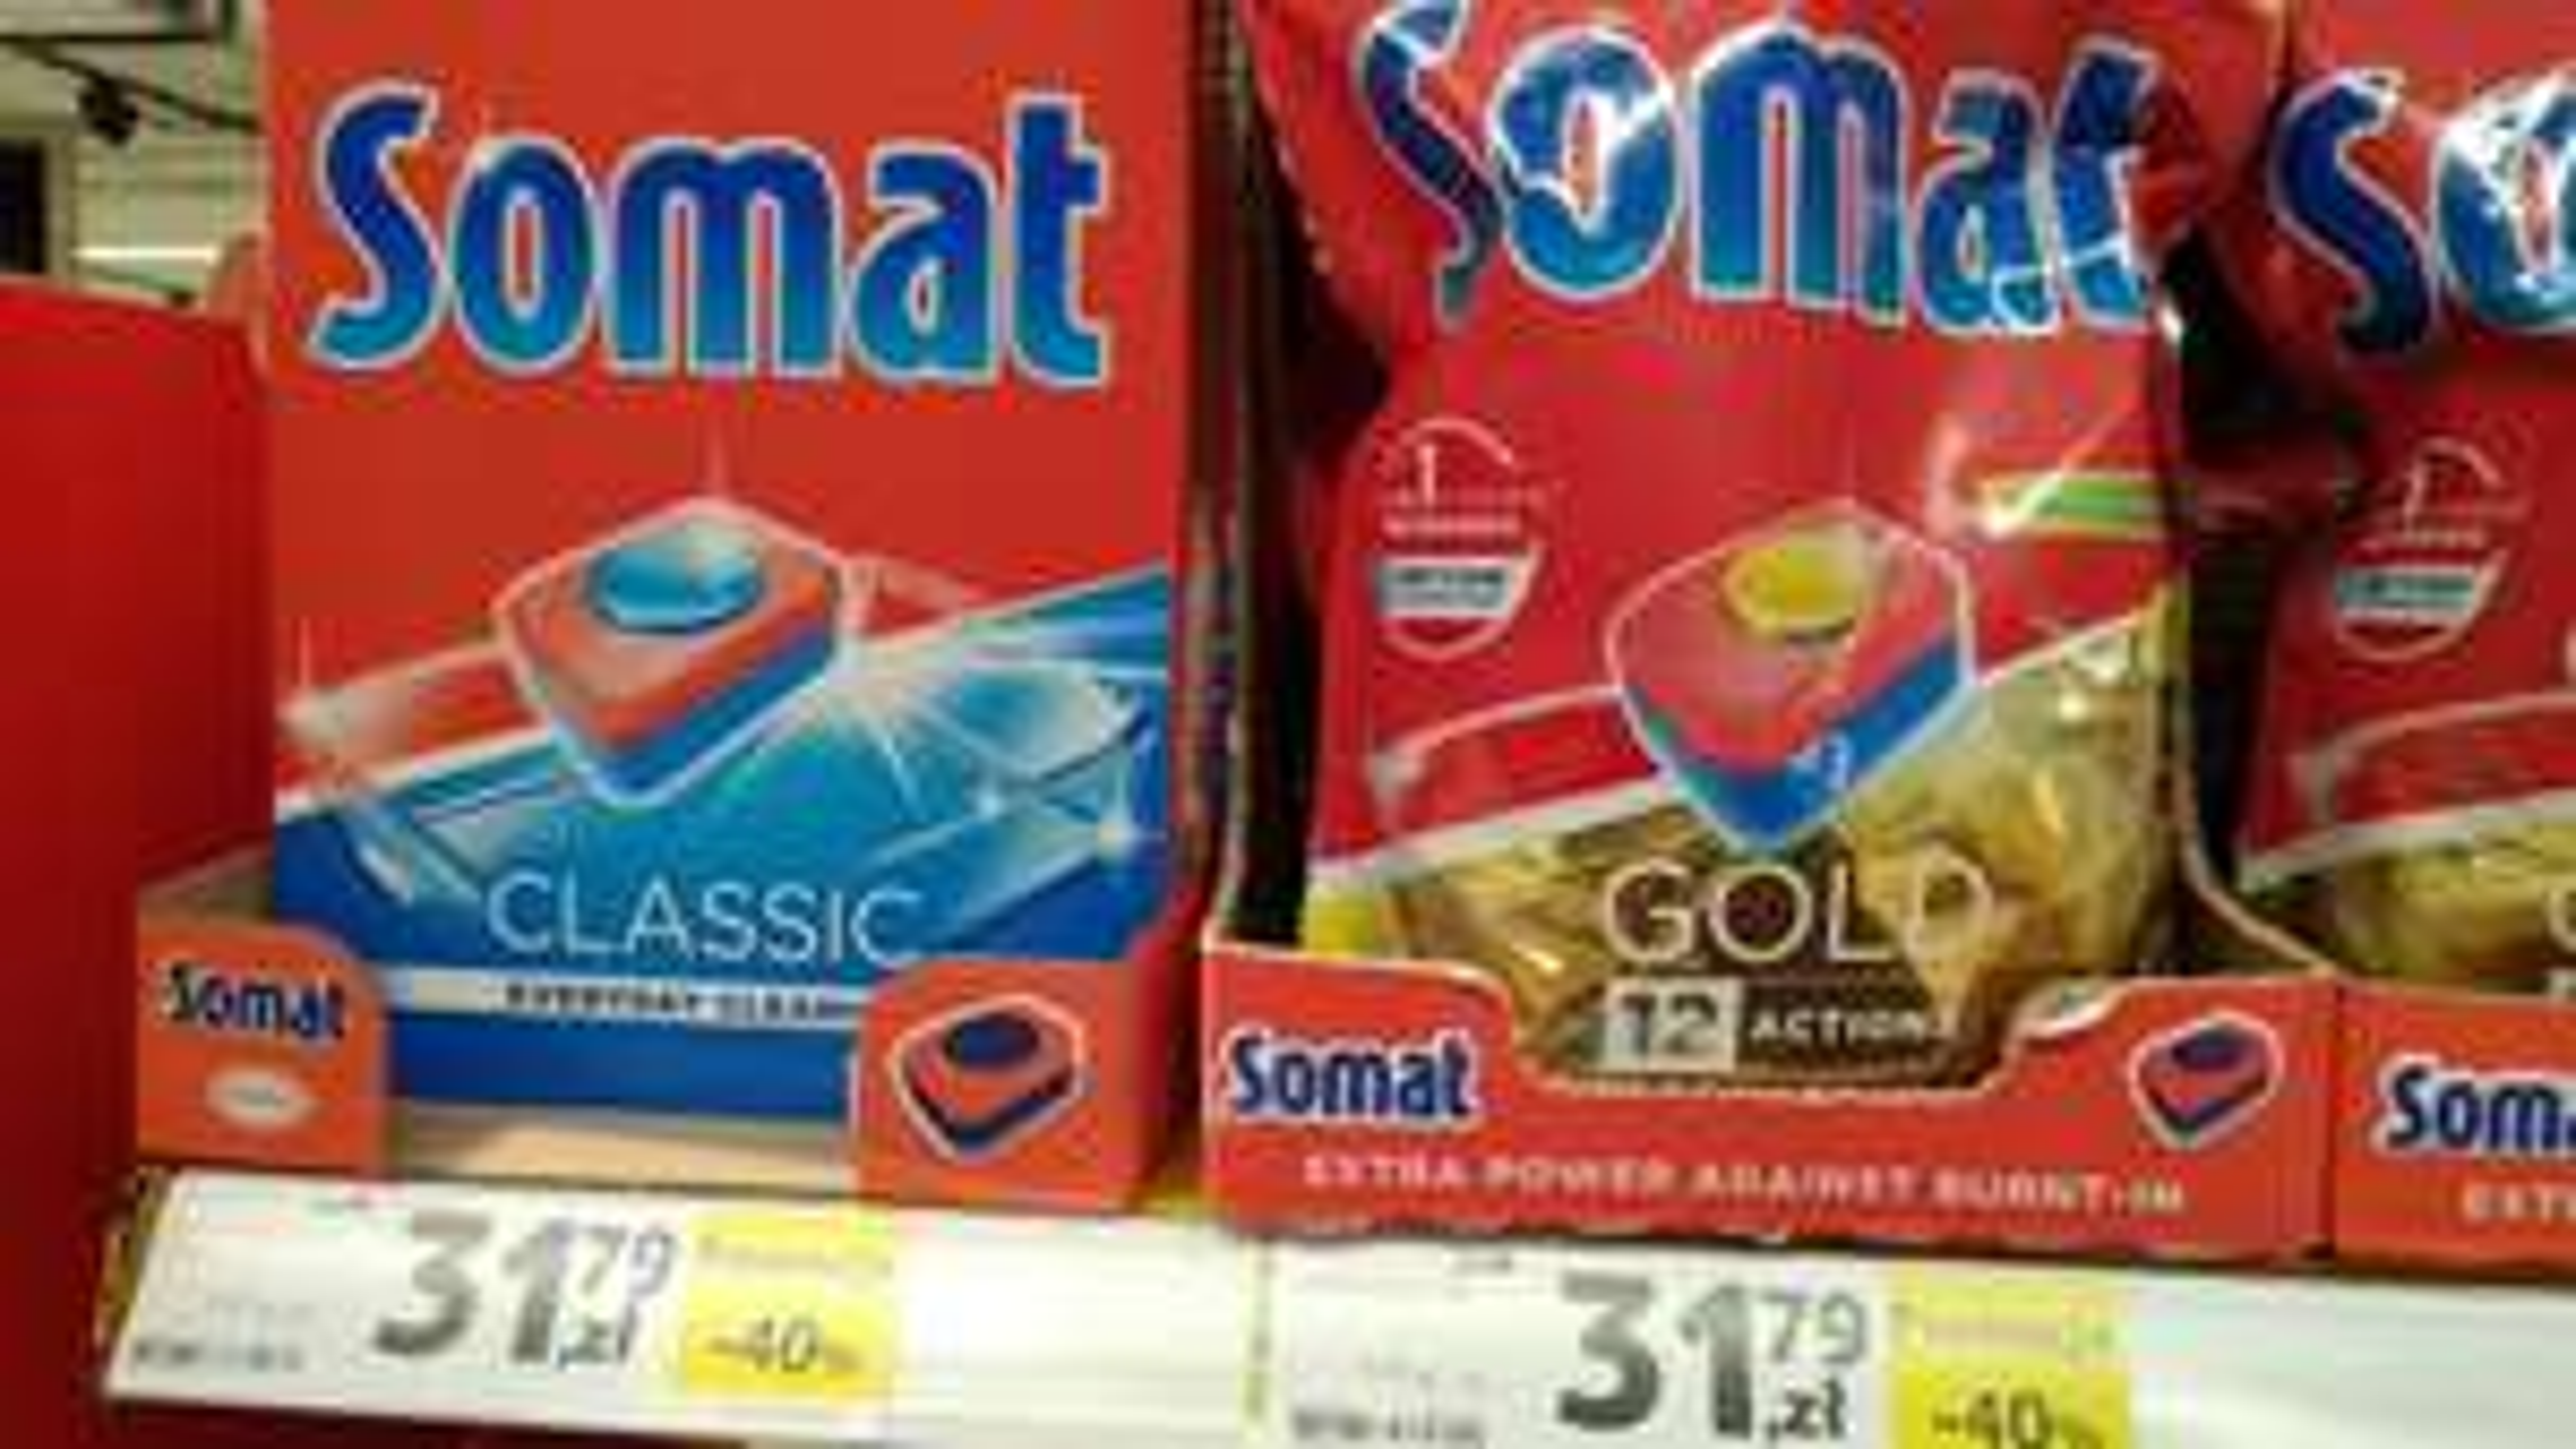 Somat Gold 54 tabletki w Tesco